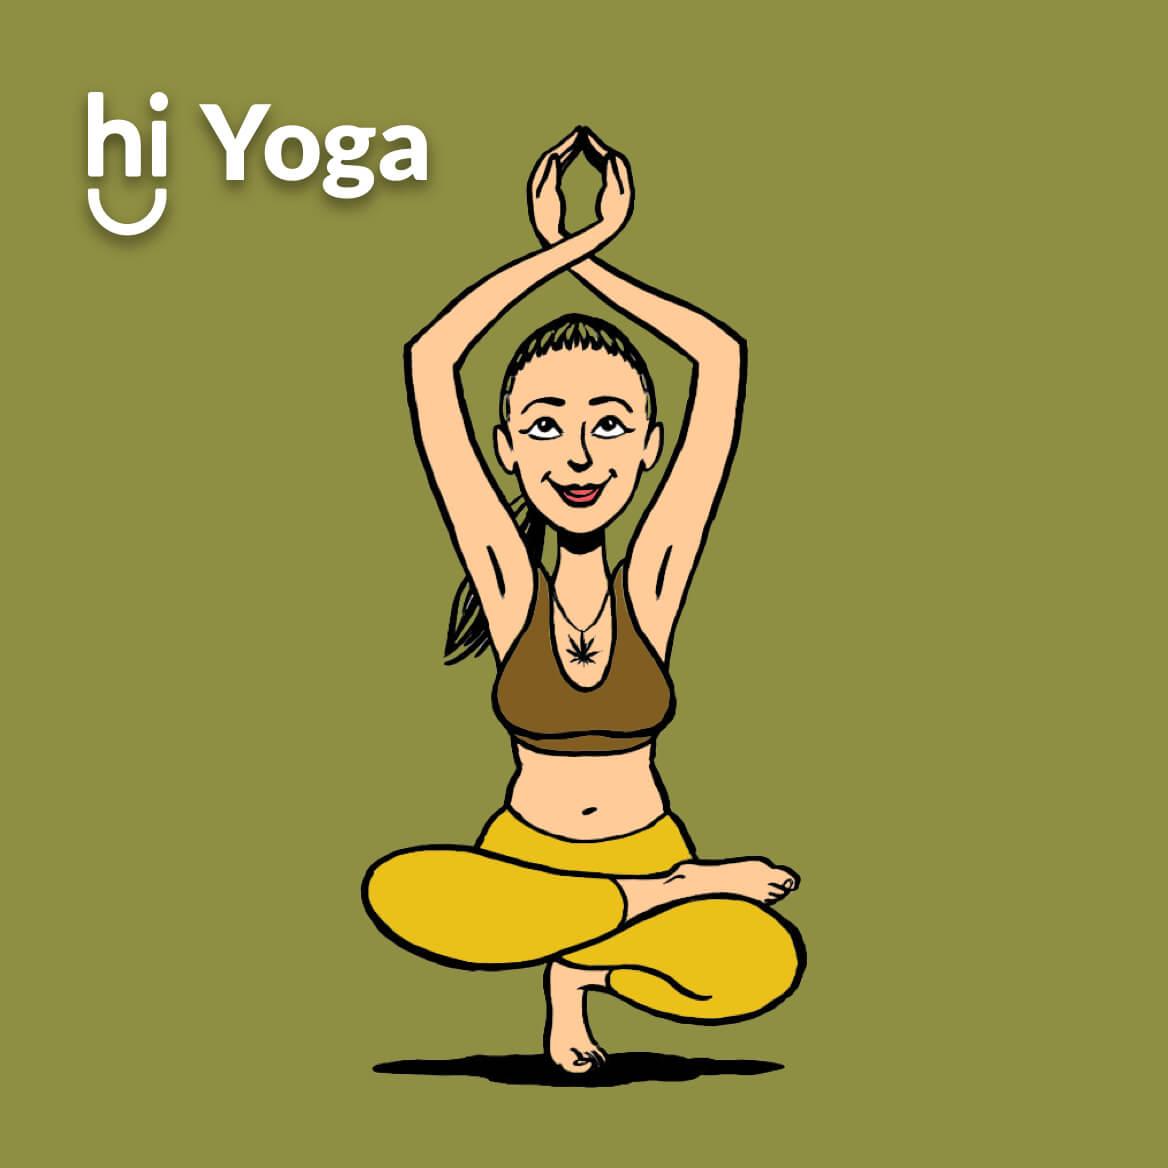 Hi Yoga